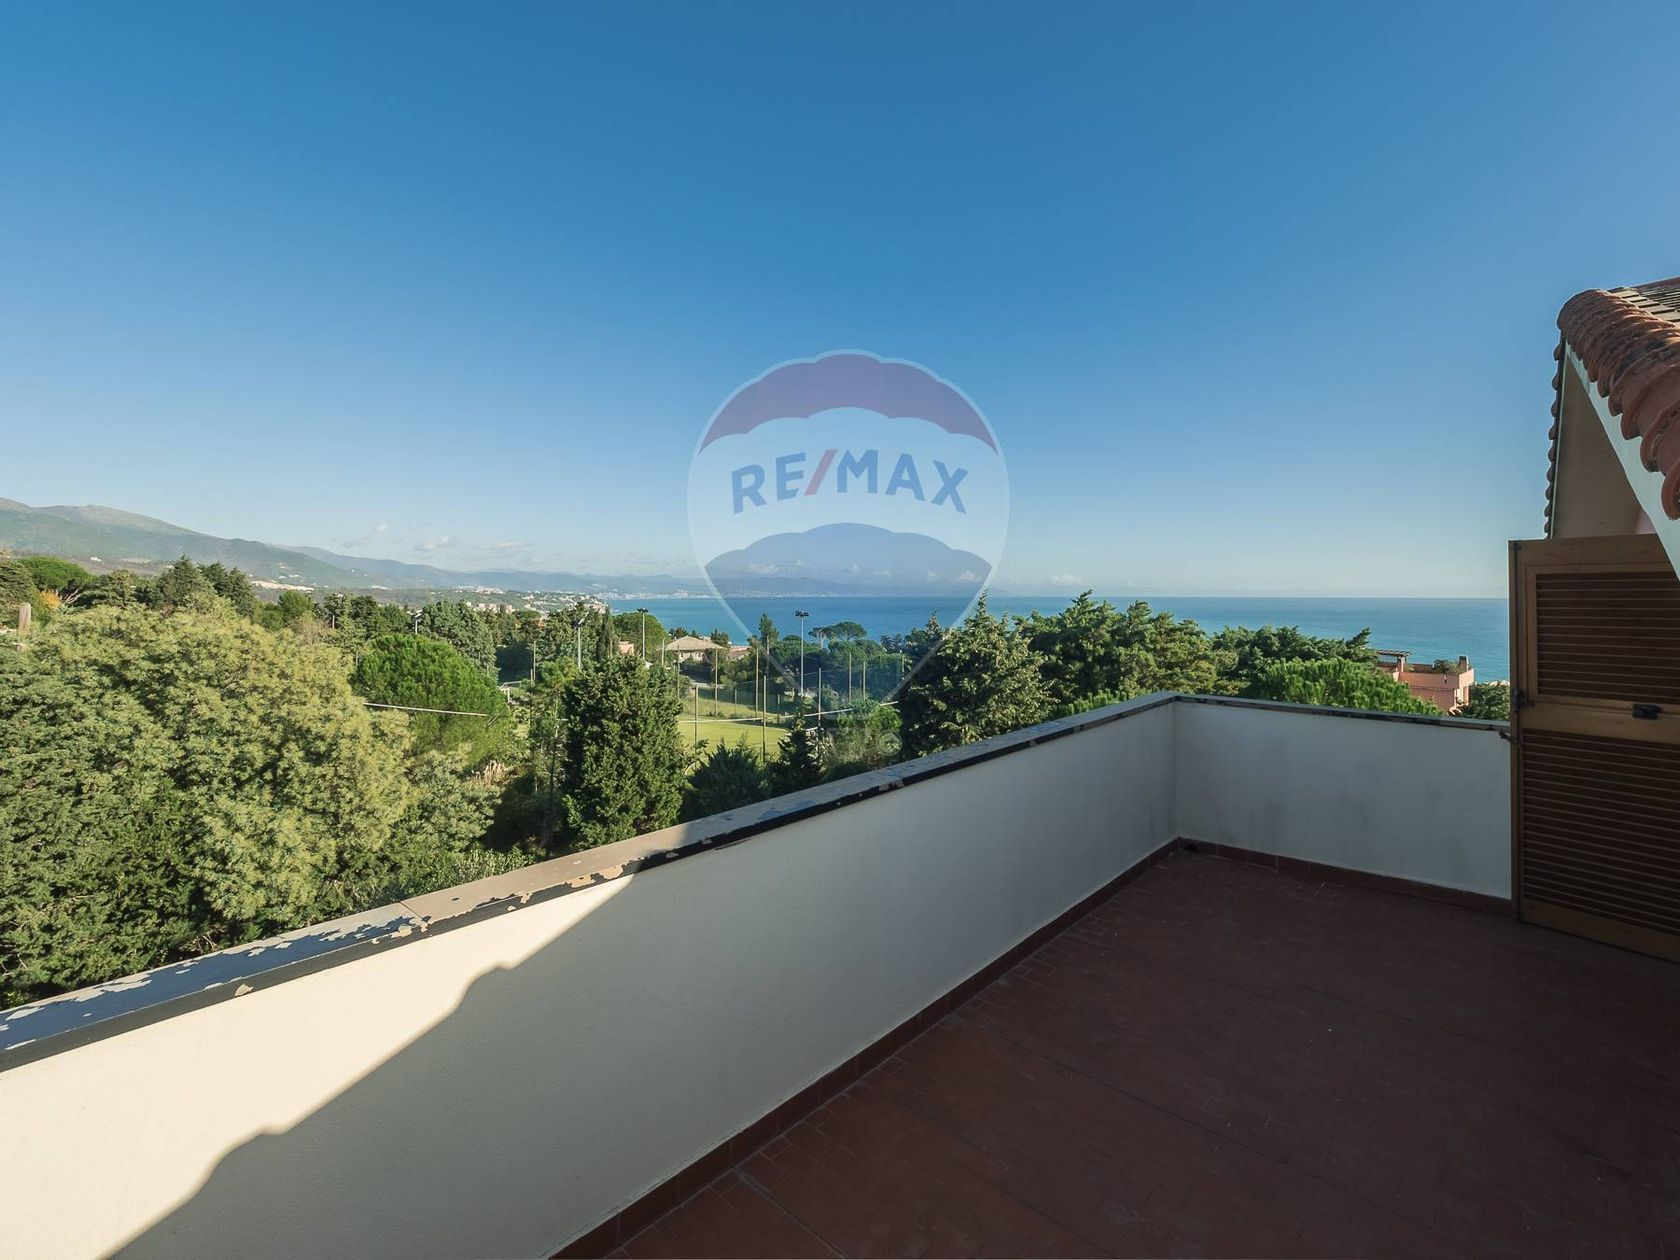 Agenzie Immobiliari Varazze appartamento in vendita varazze 30151001-638 | re/max italia